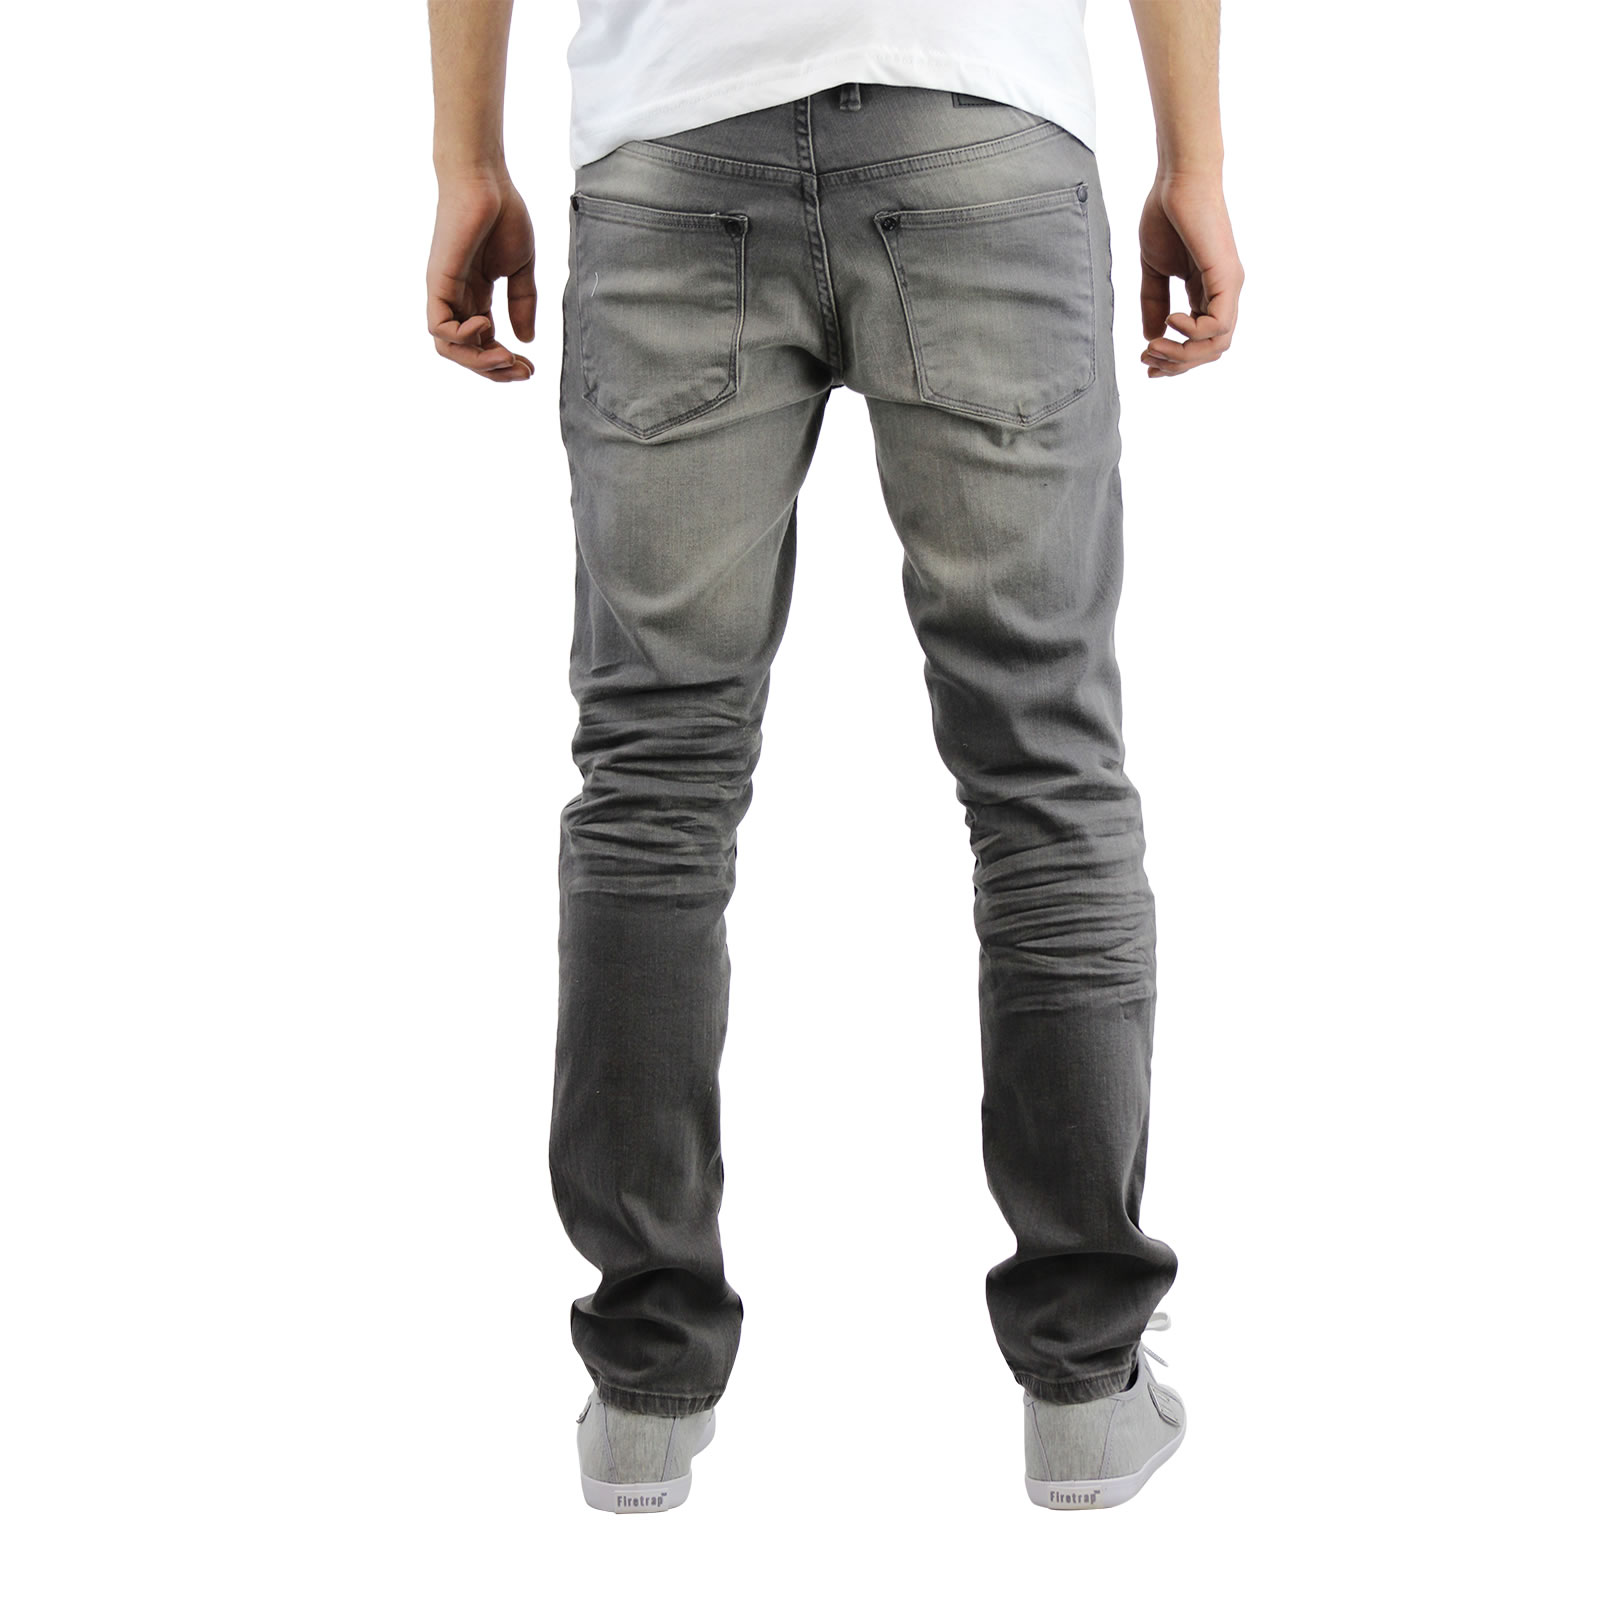 miniature 10 - Homme-Crosshatch-Jaco-Slim-Jeans-stretch-pantalon-denim-effet-vieilli